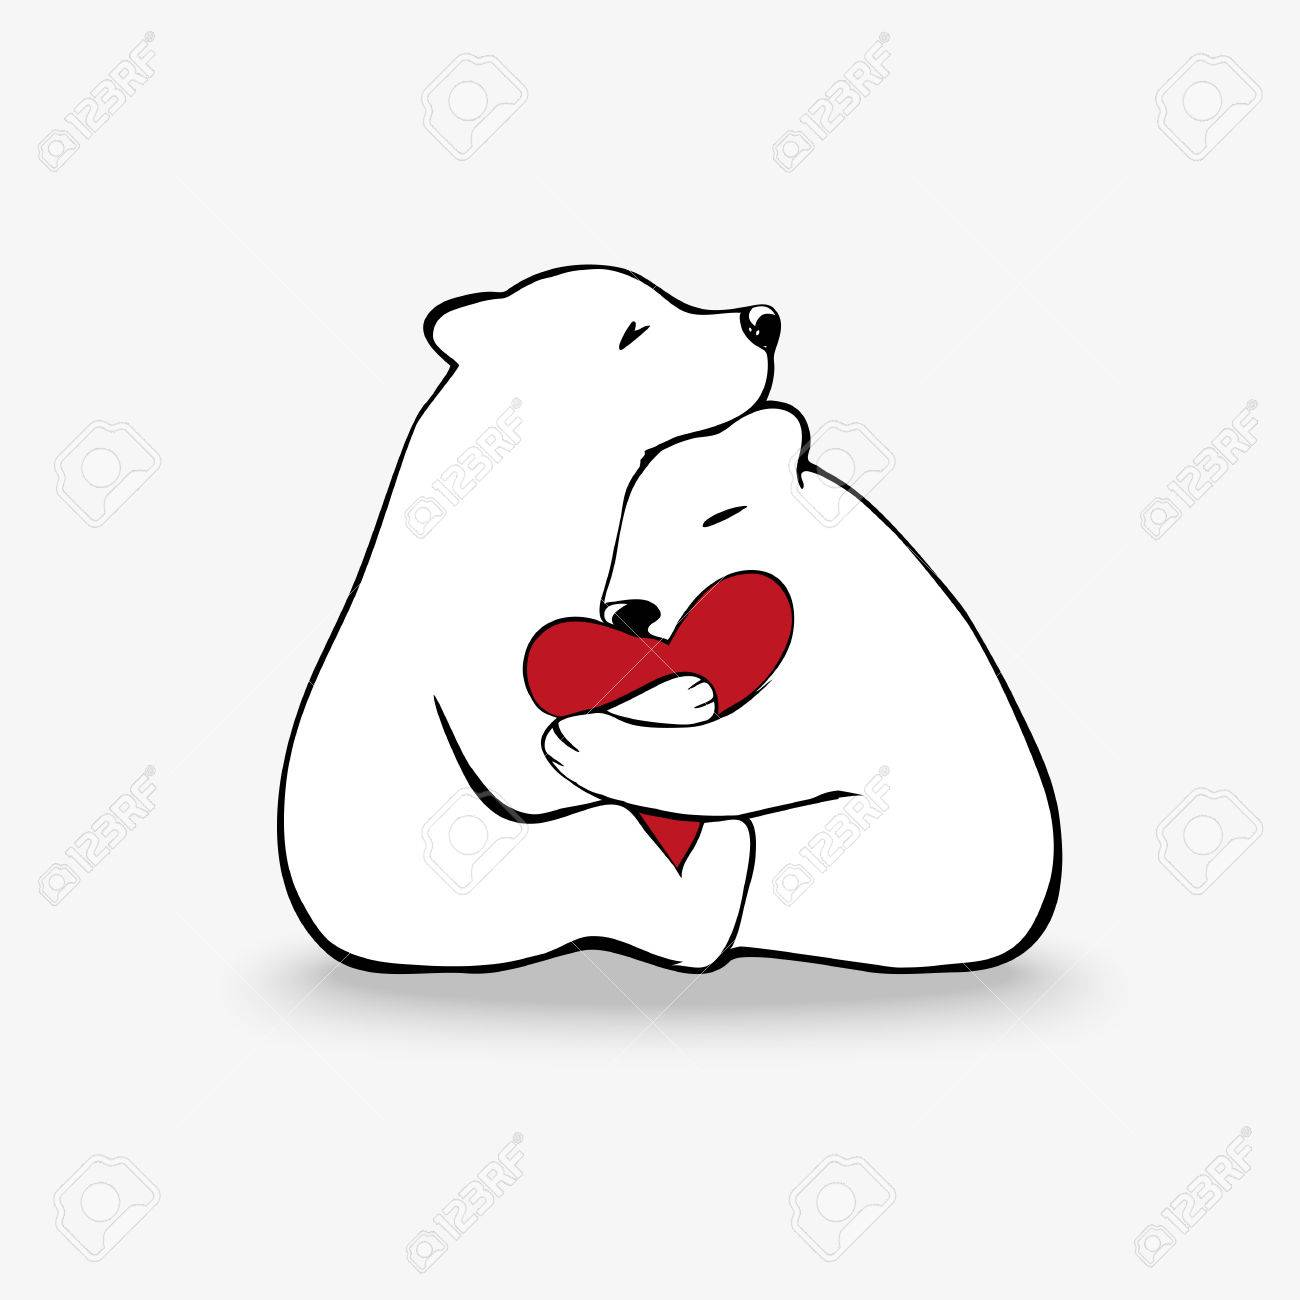 hugging polar bears in love cute animal love theme illustration